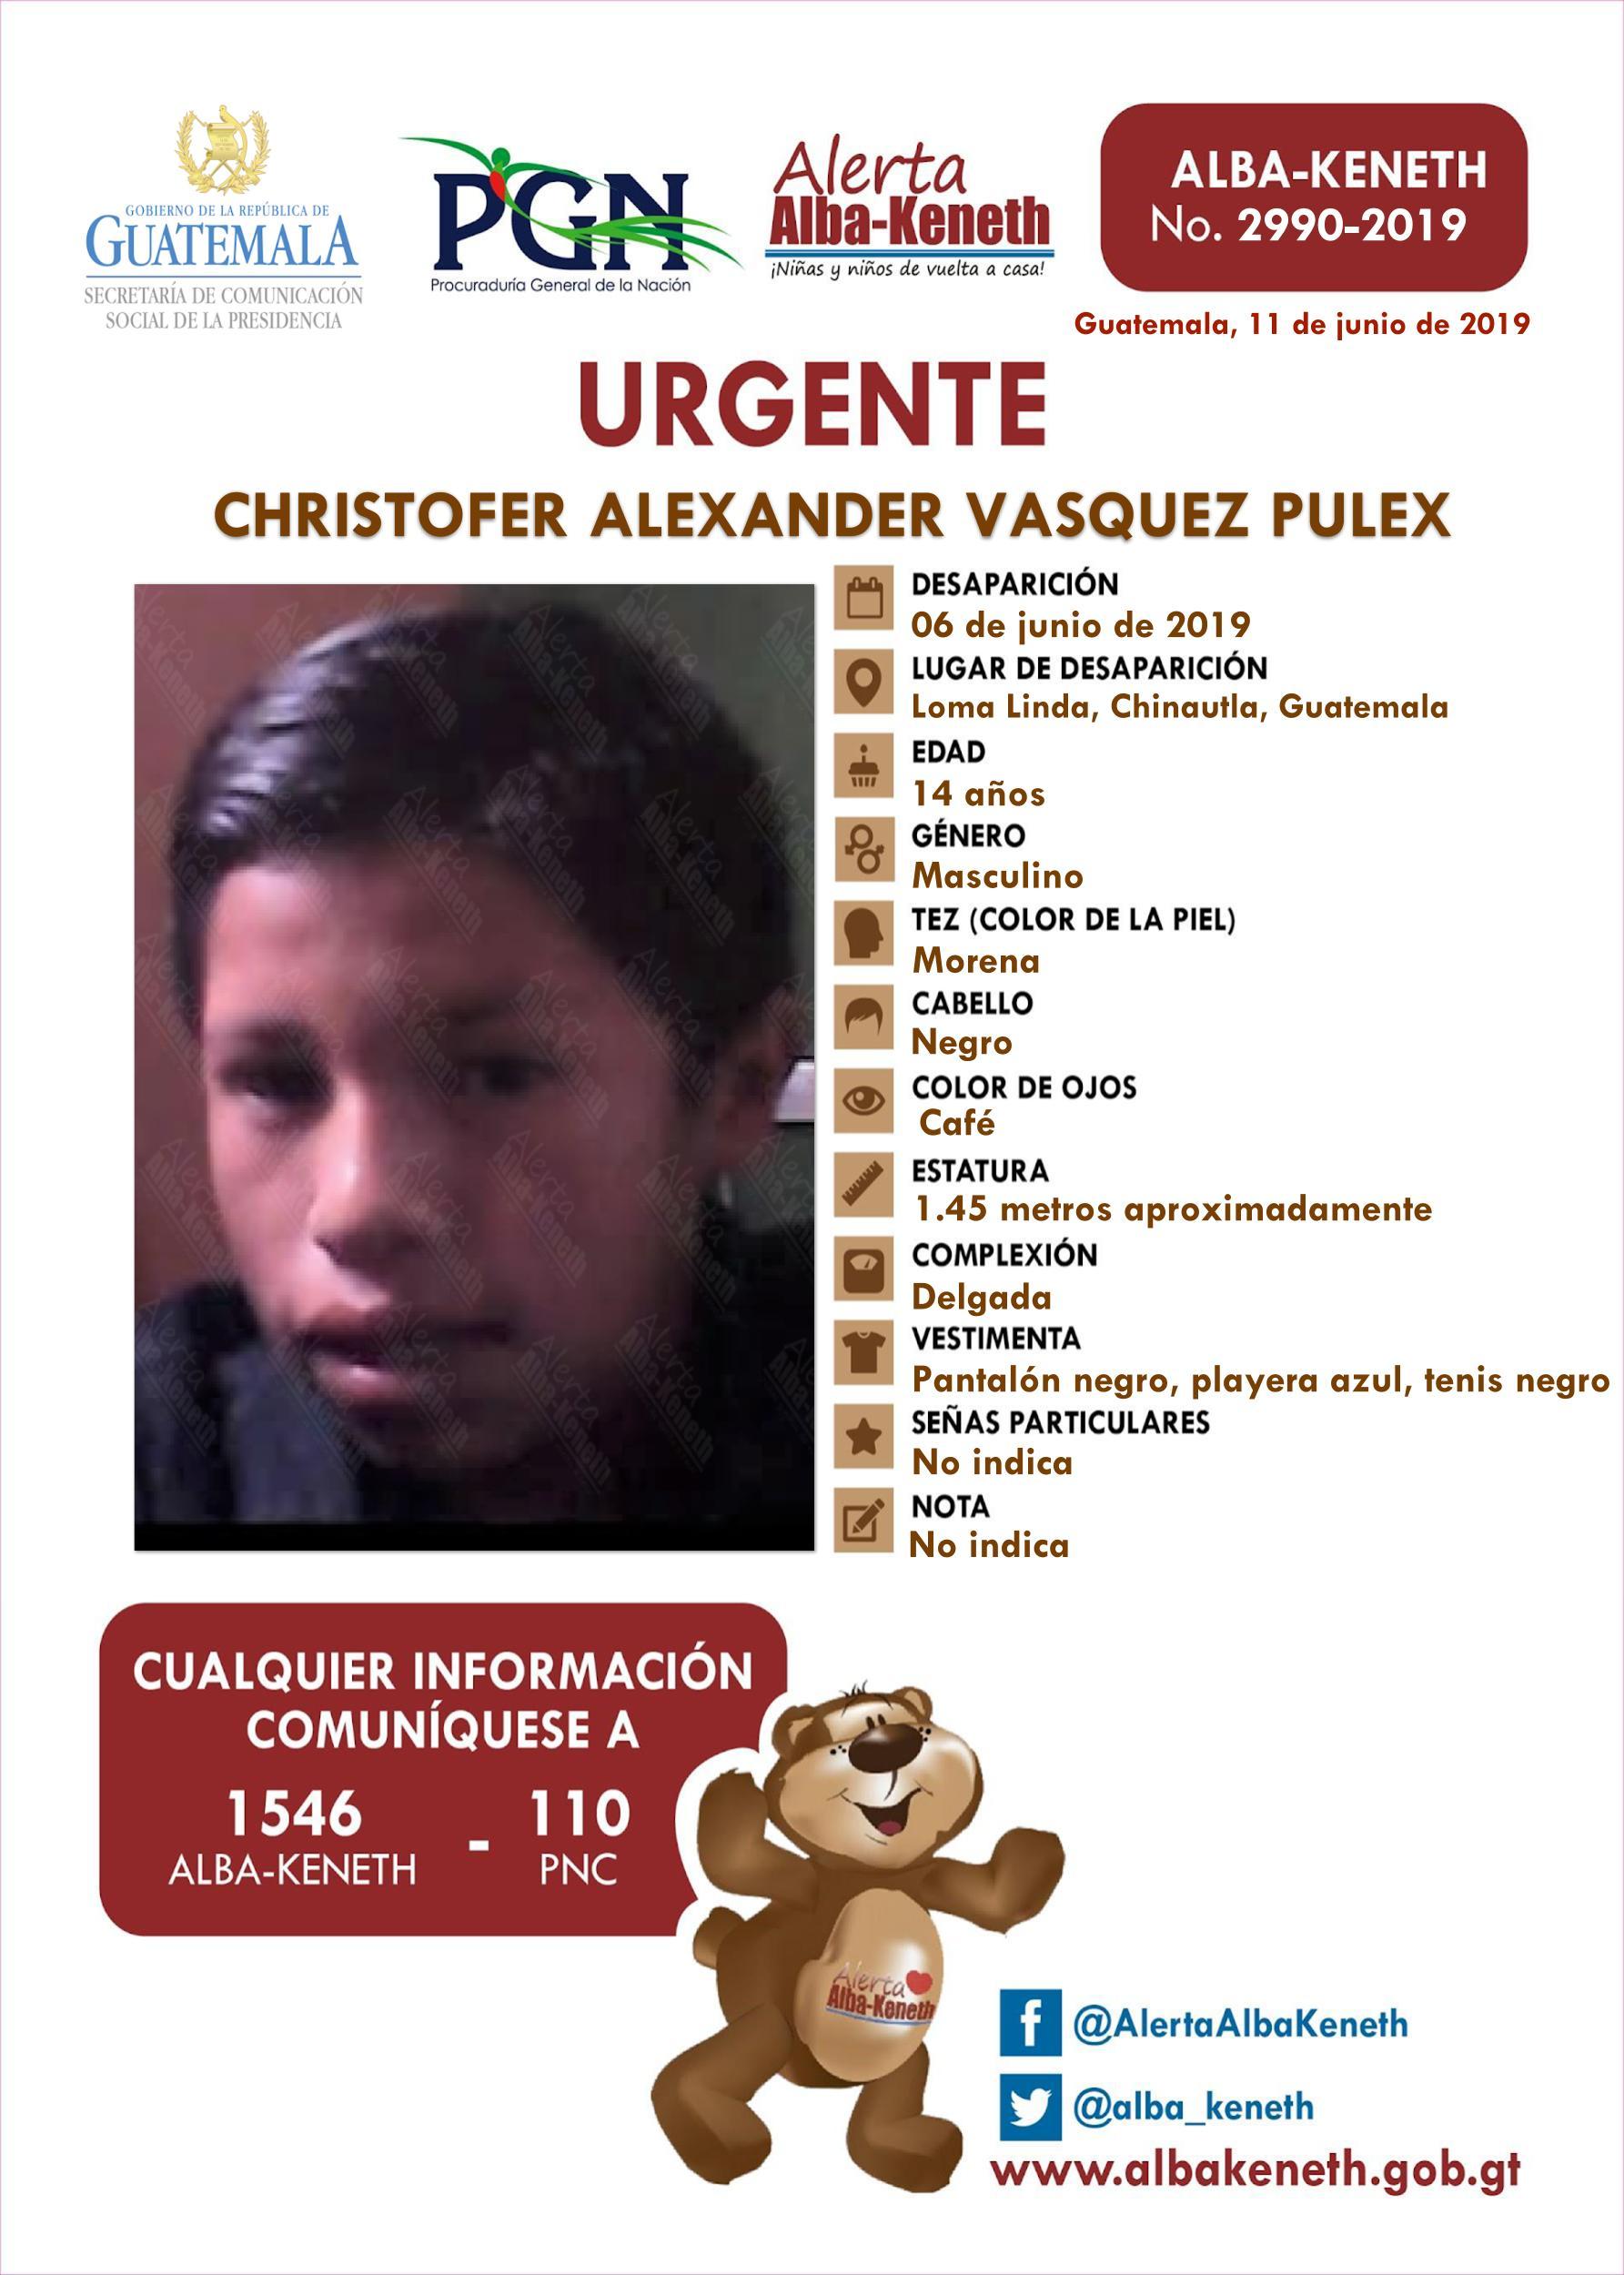 Christofer Alexander Vasquez Pulex